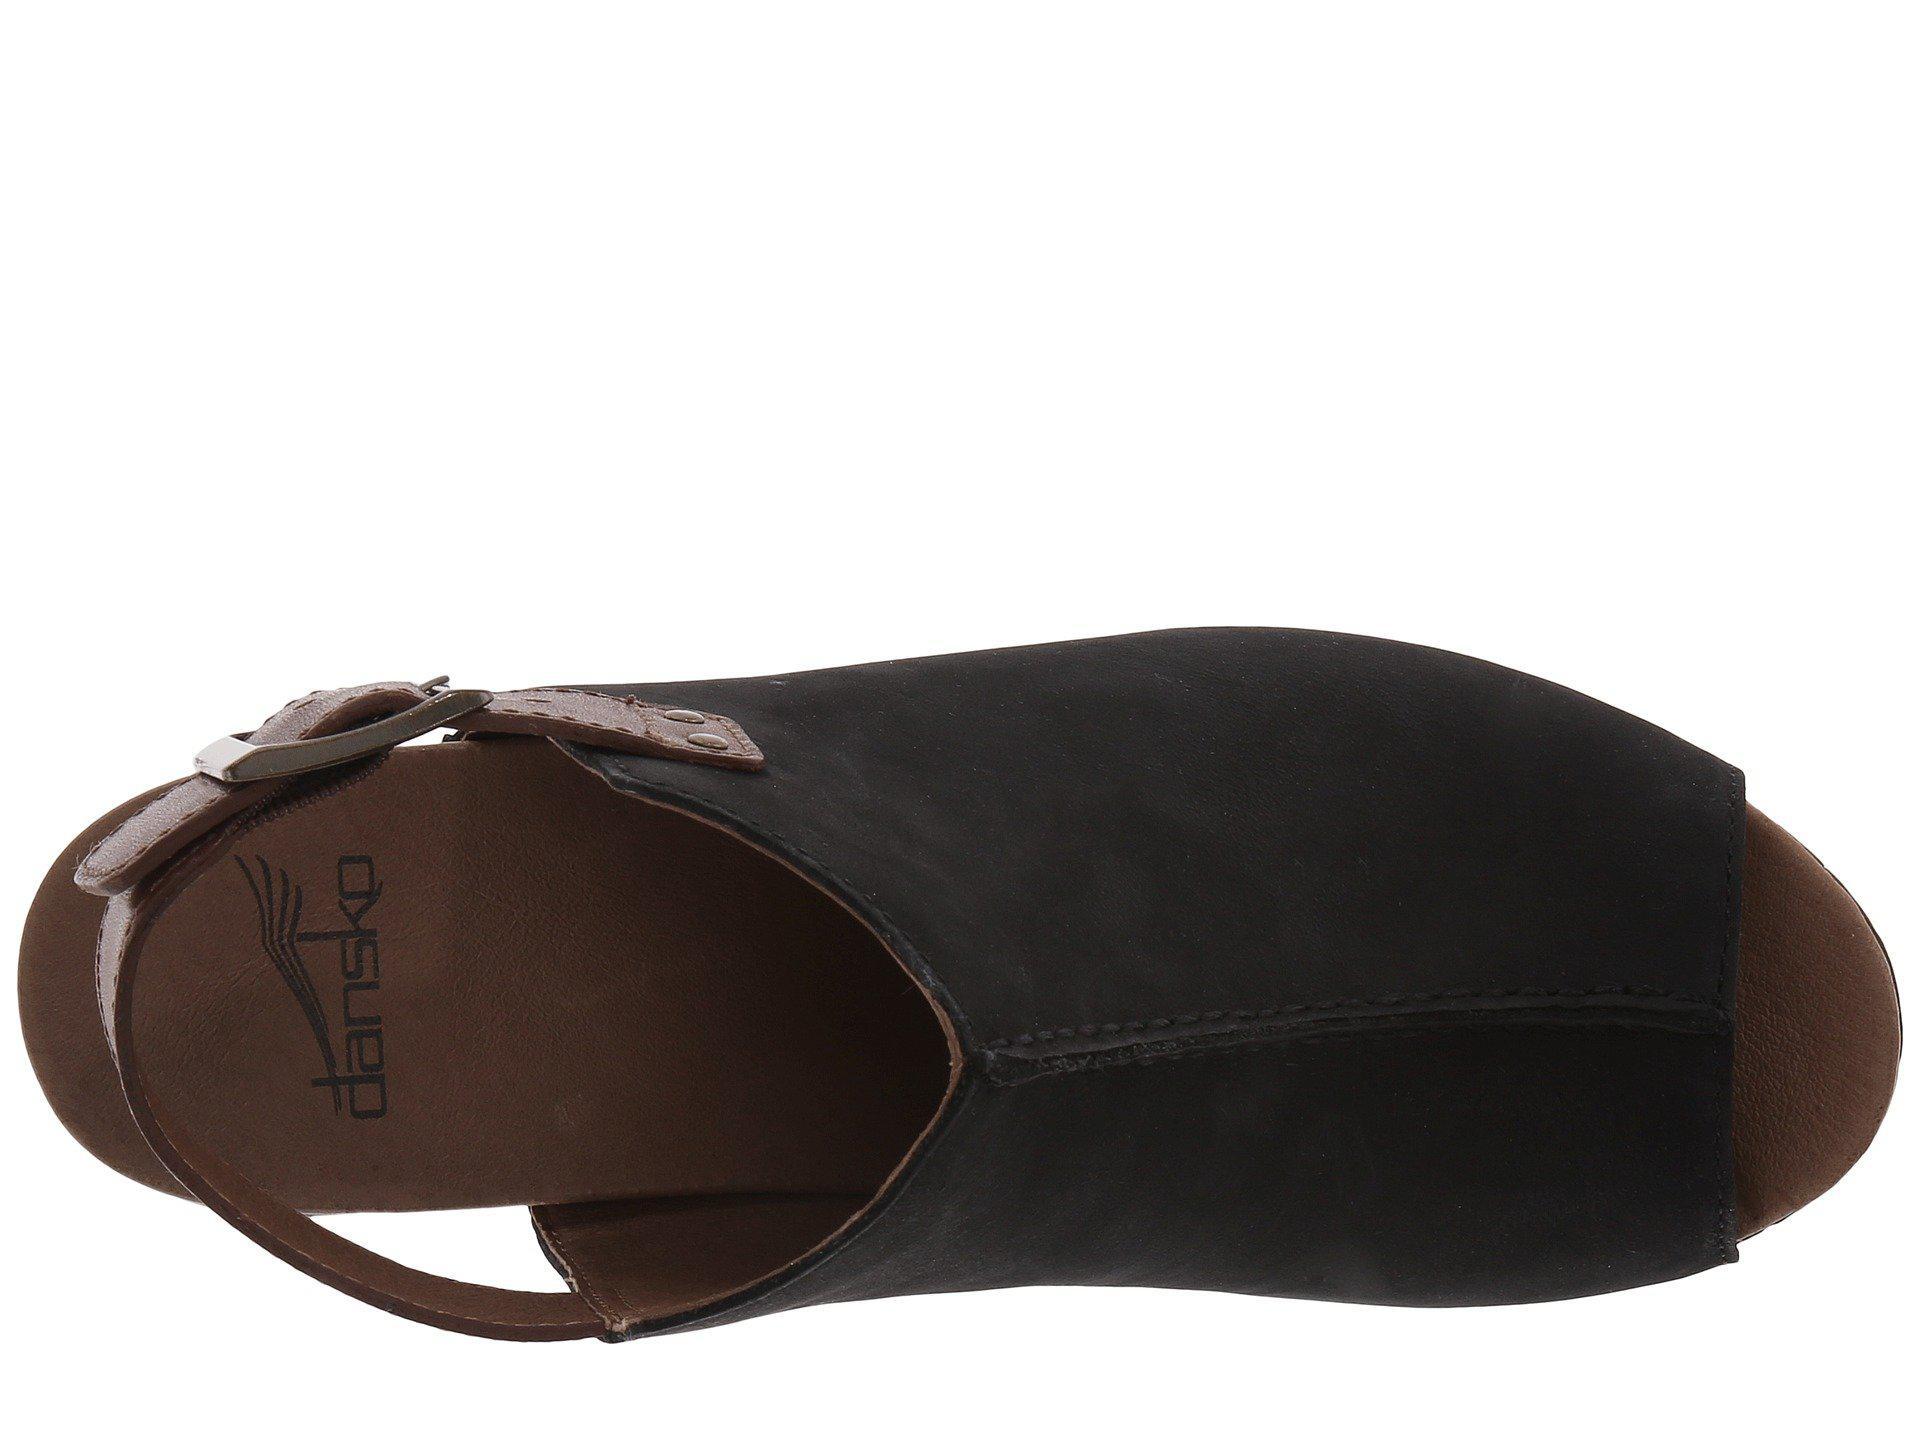 7635252b3fb Dansko - Black Reggie (taupe Milled Nubuck) High Heels - Lyst. View  fullscreen